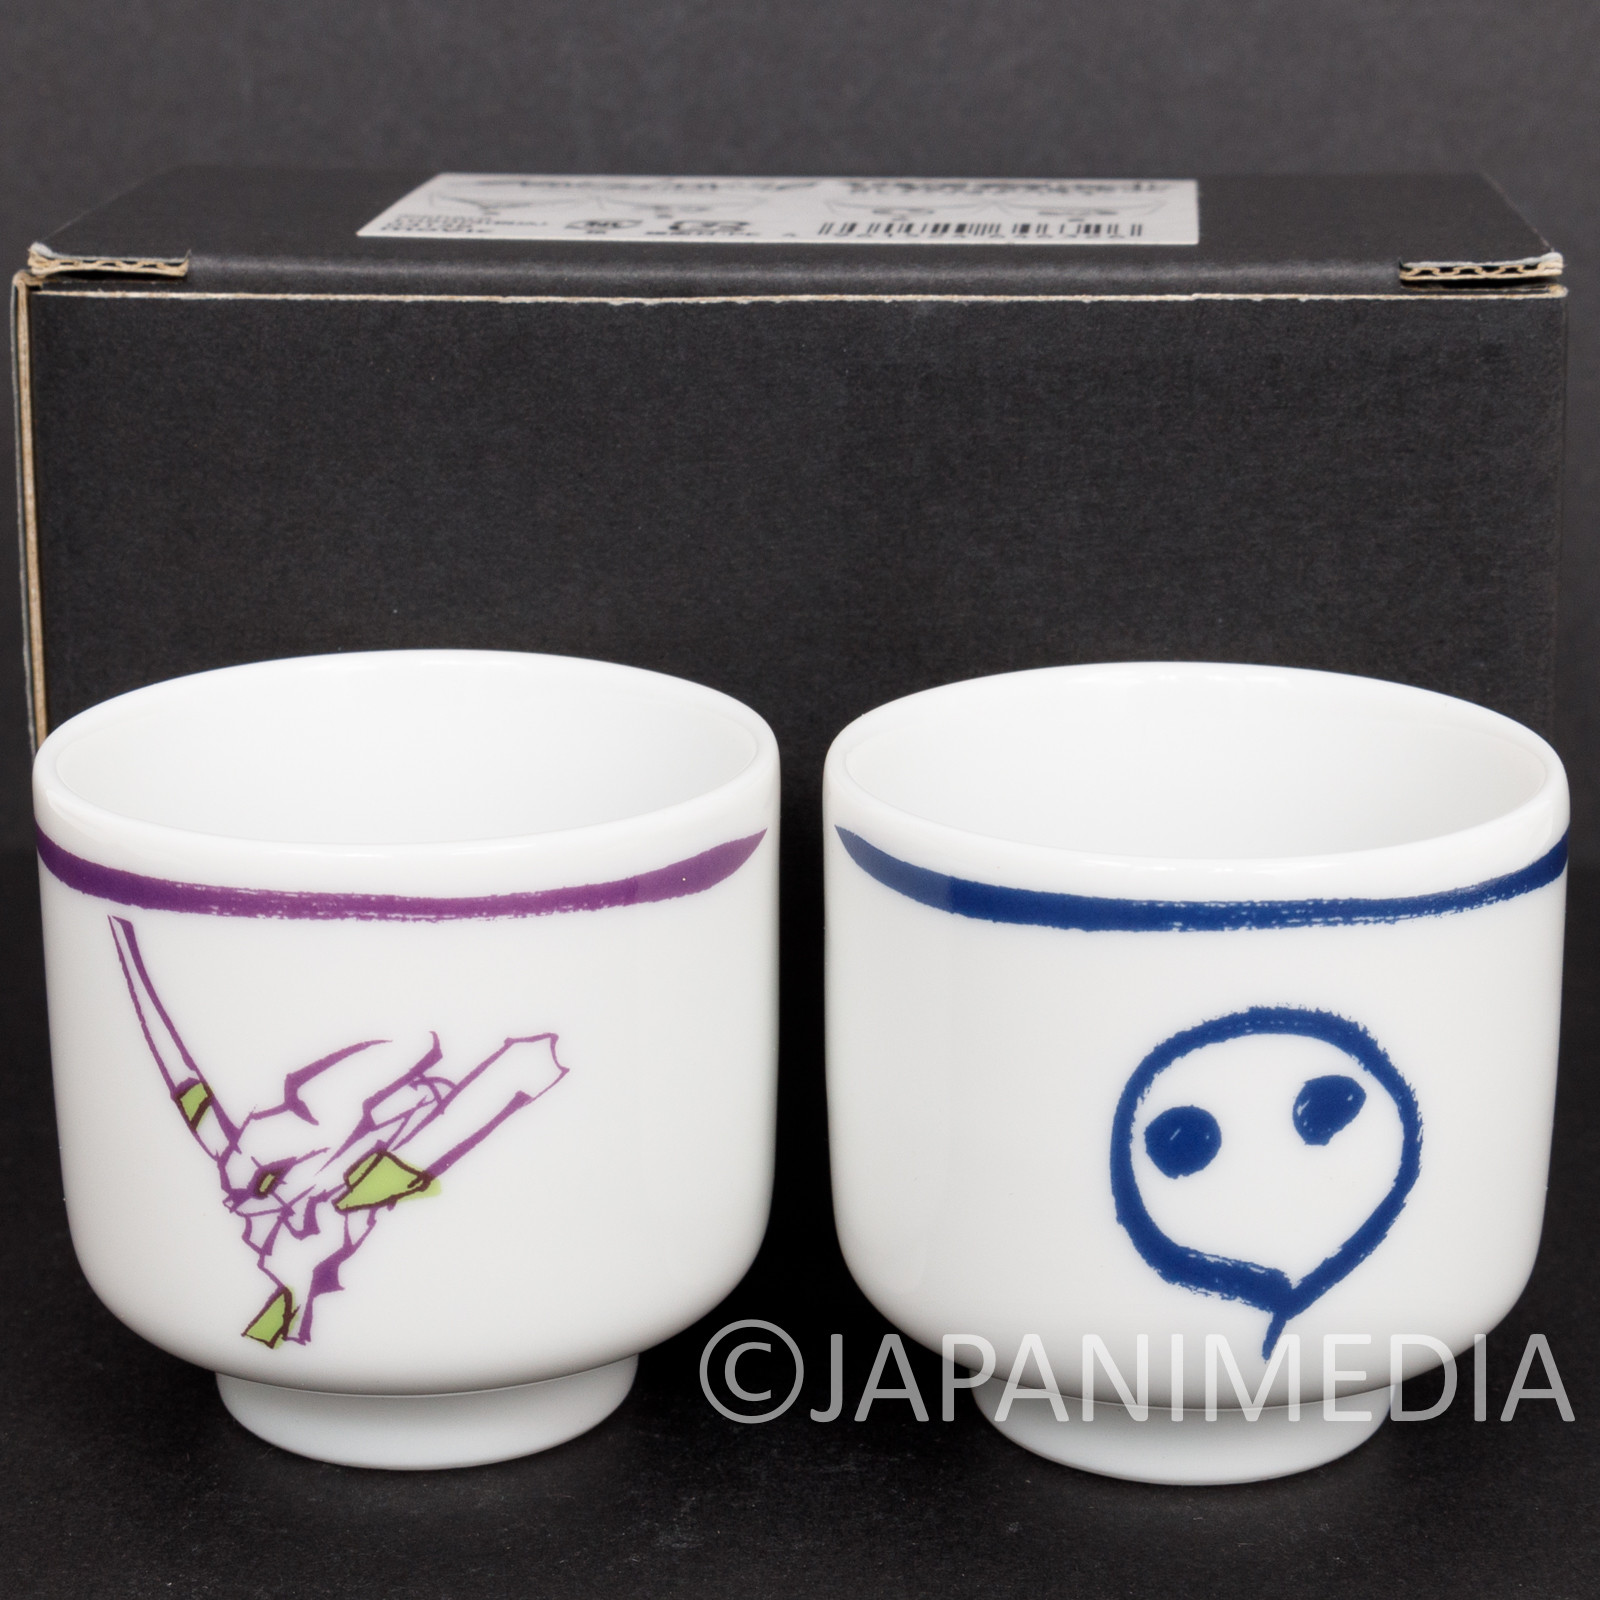 Evangelion Japanese Cup Ochoko 2pc Set JAPAN ANIME